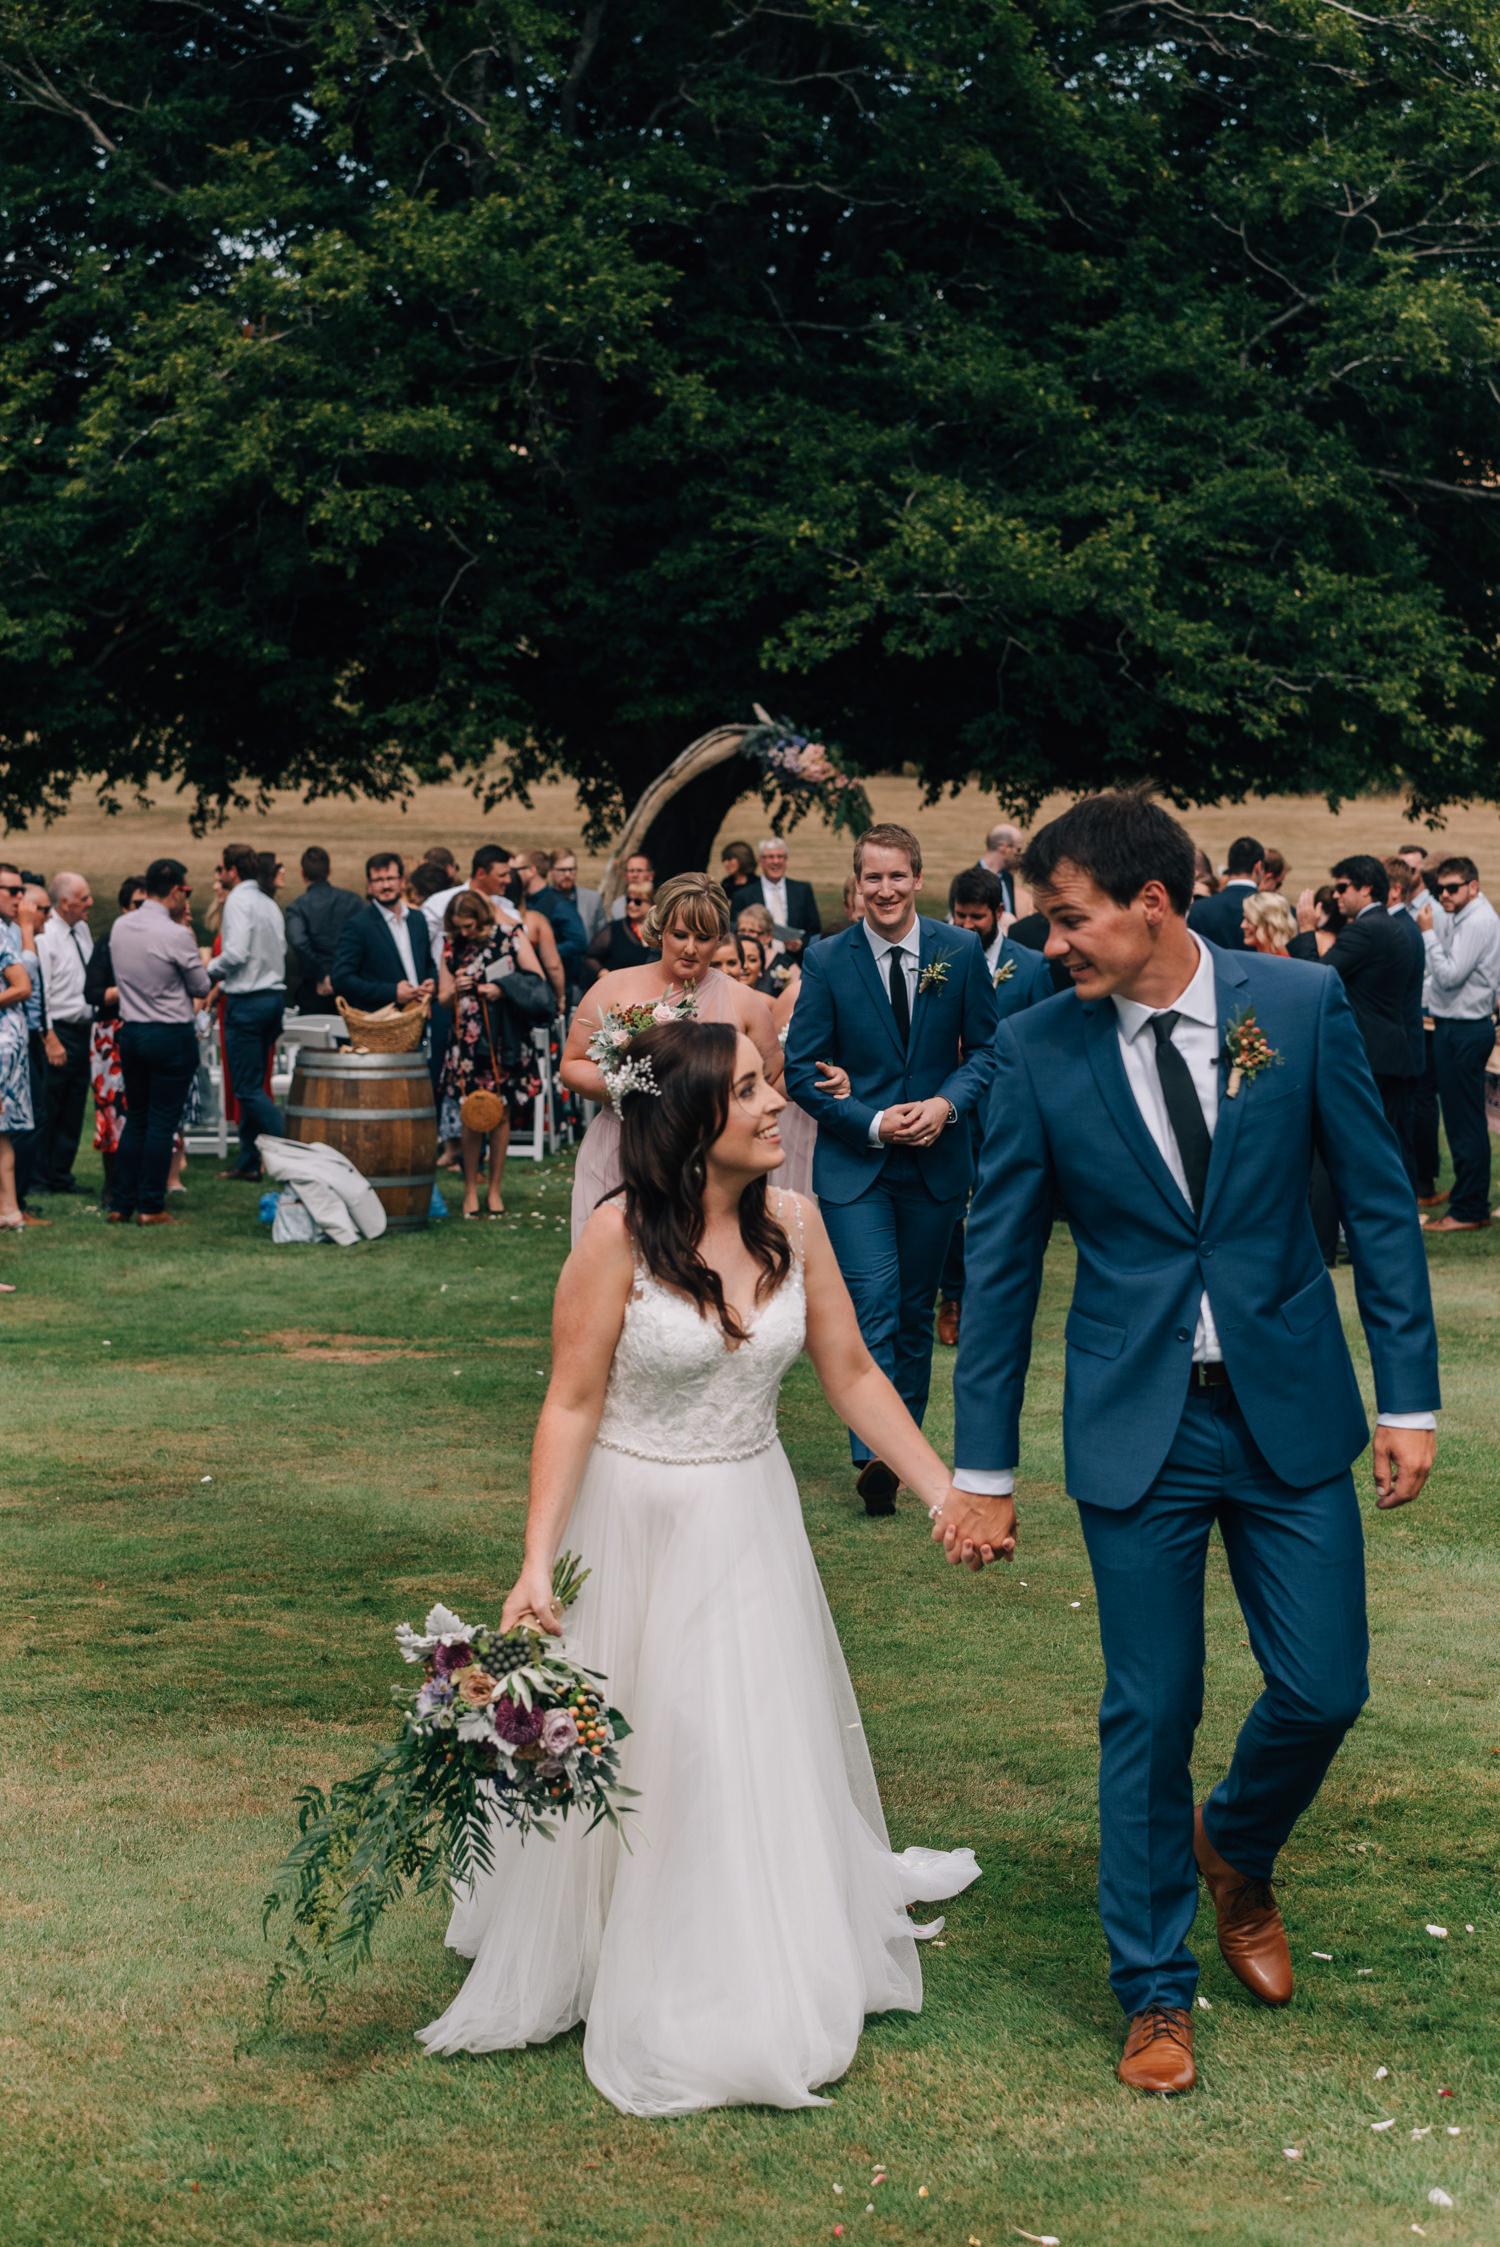 Quamby-Wedding-Photographer-85.jpg